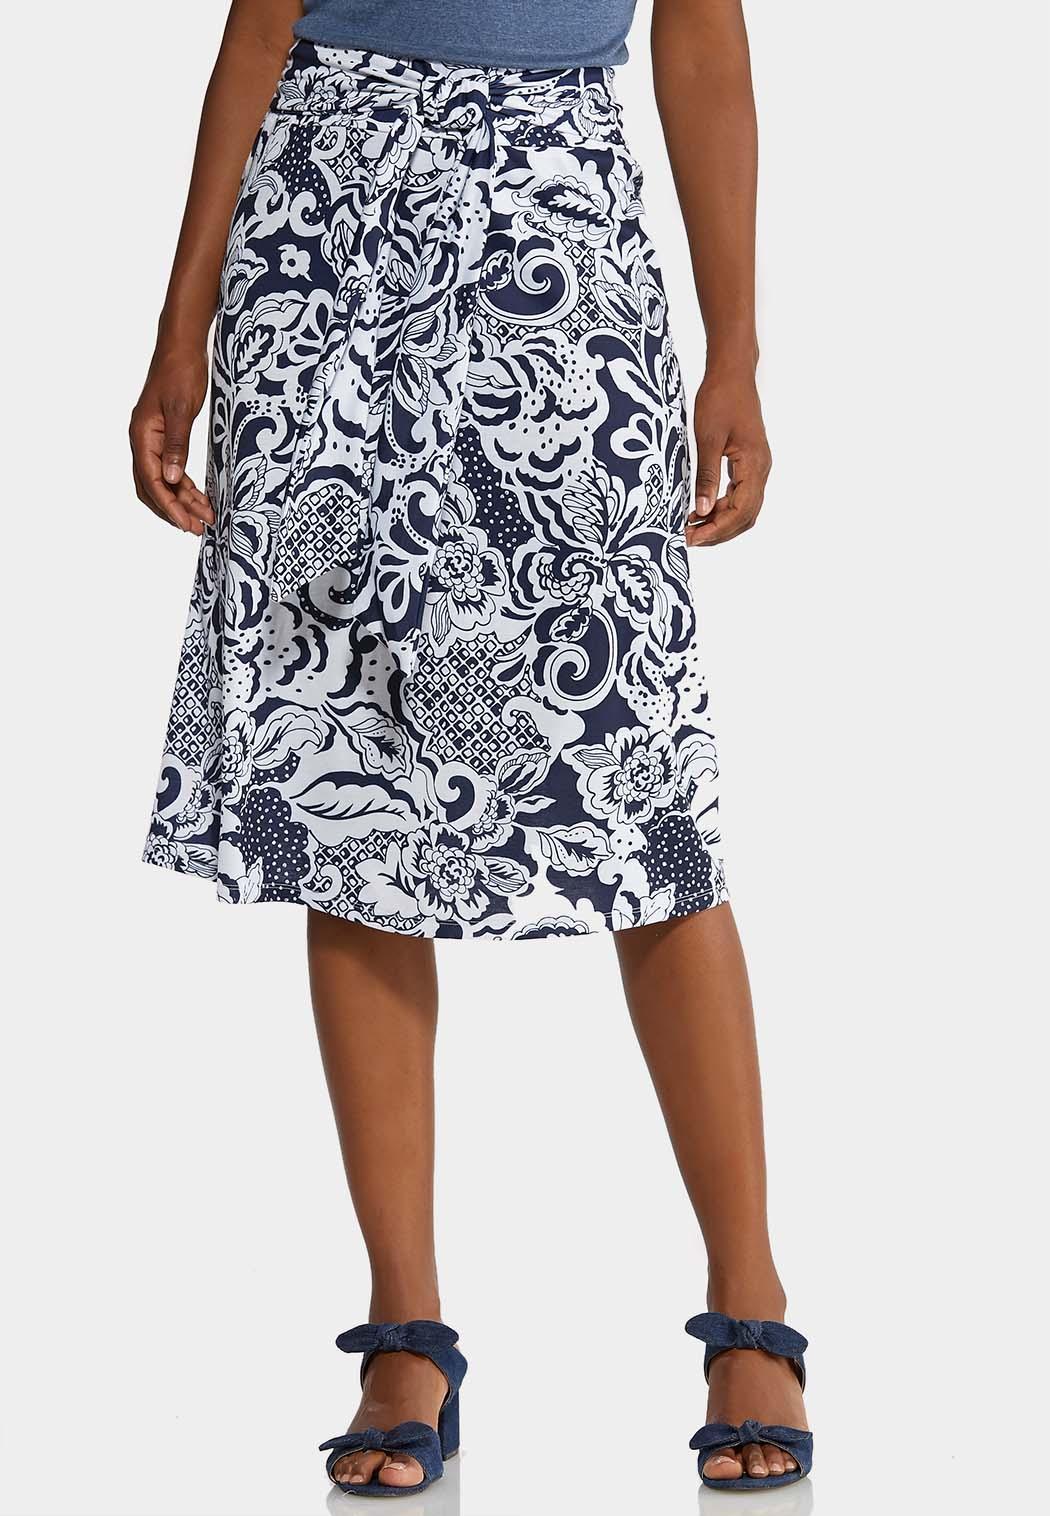 e9f0c133707 Women s Skirts